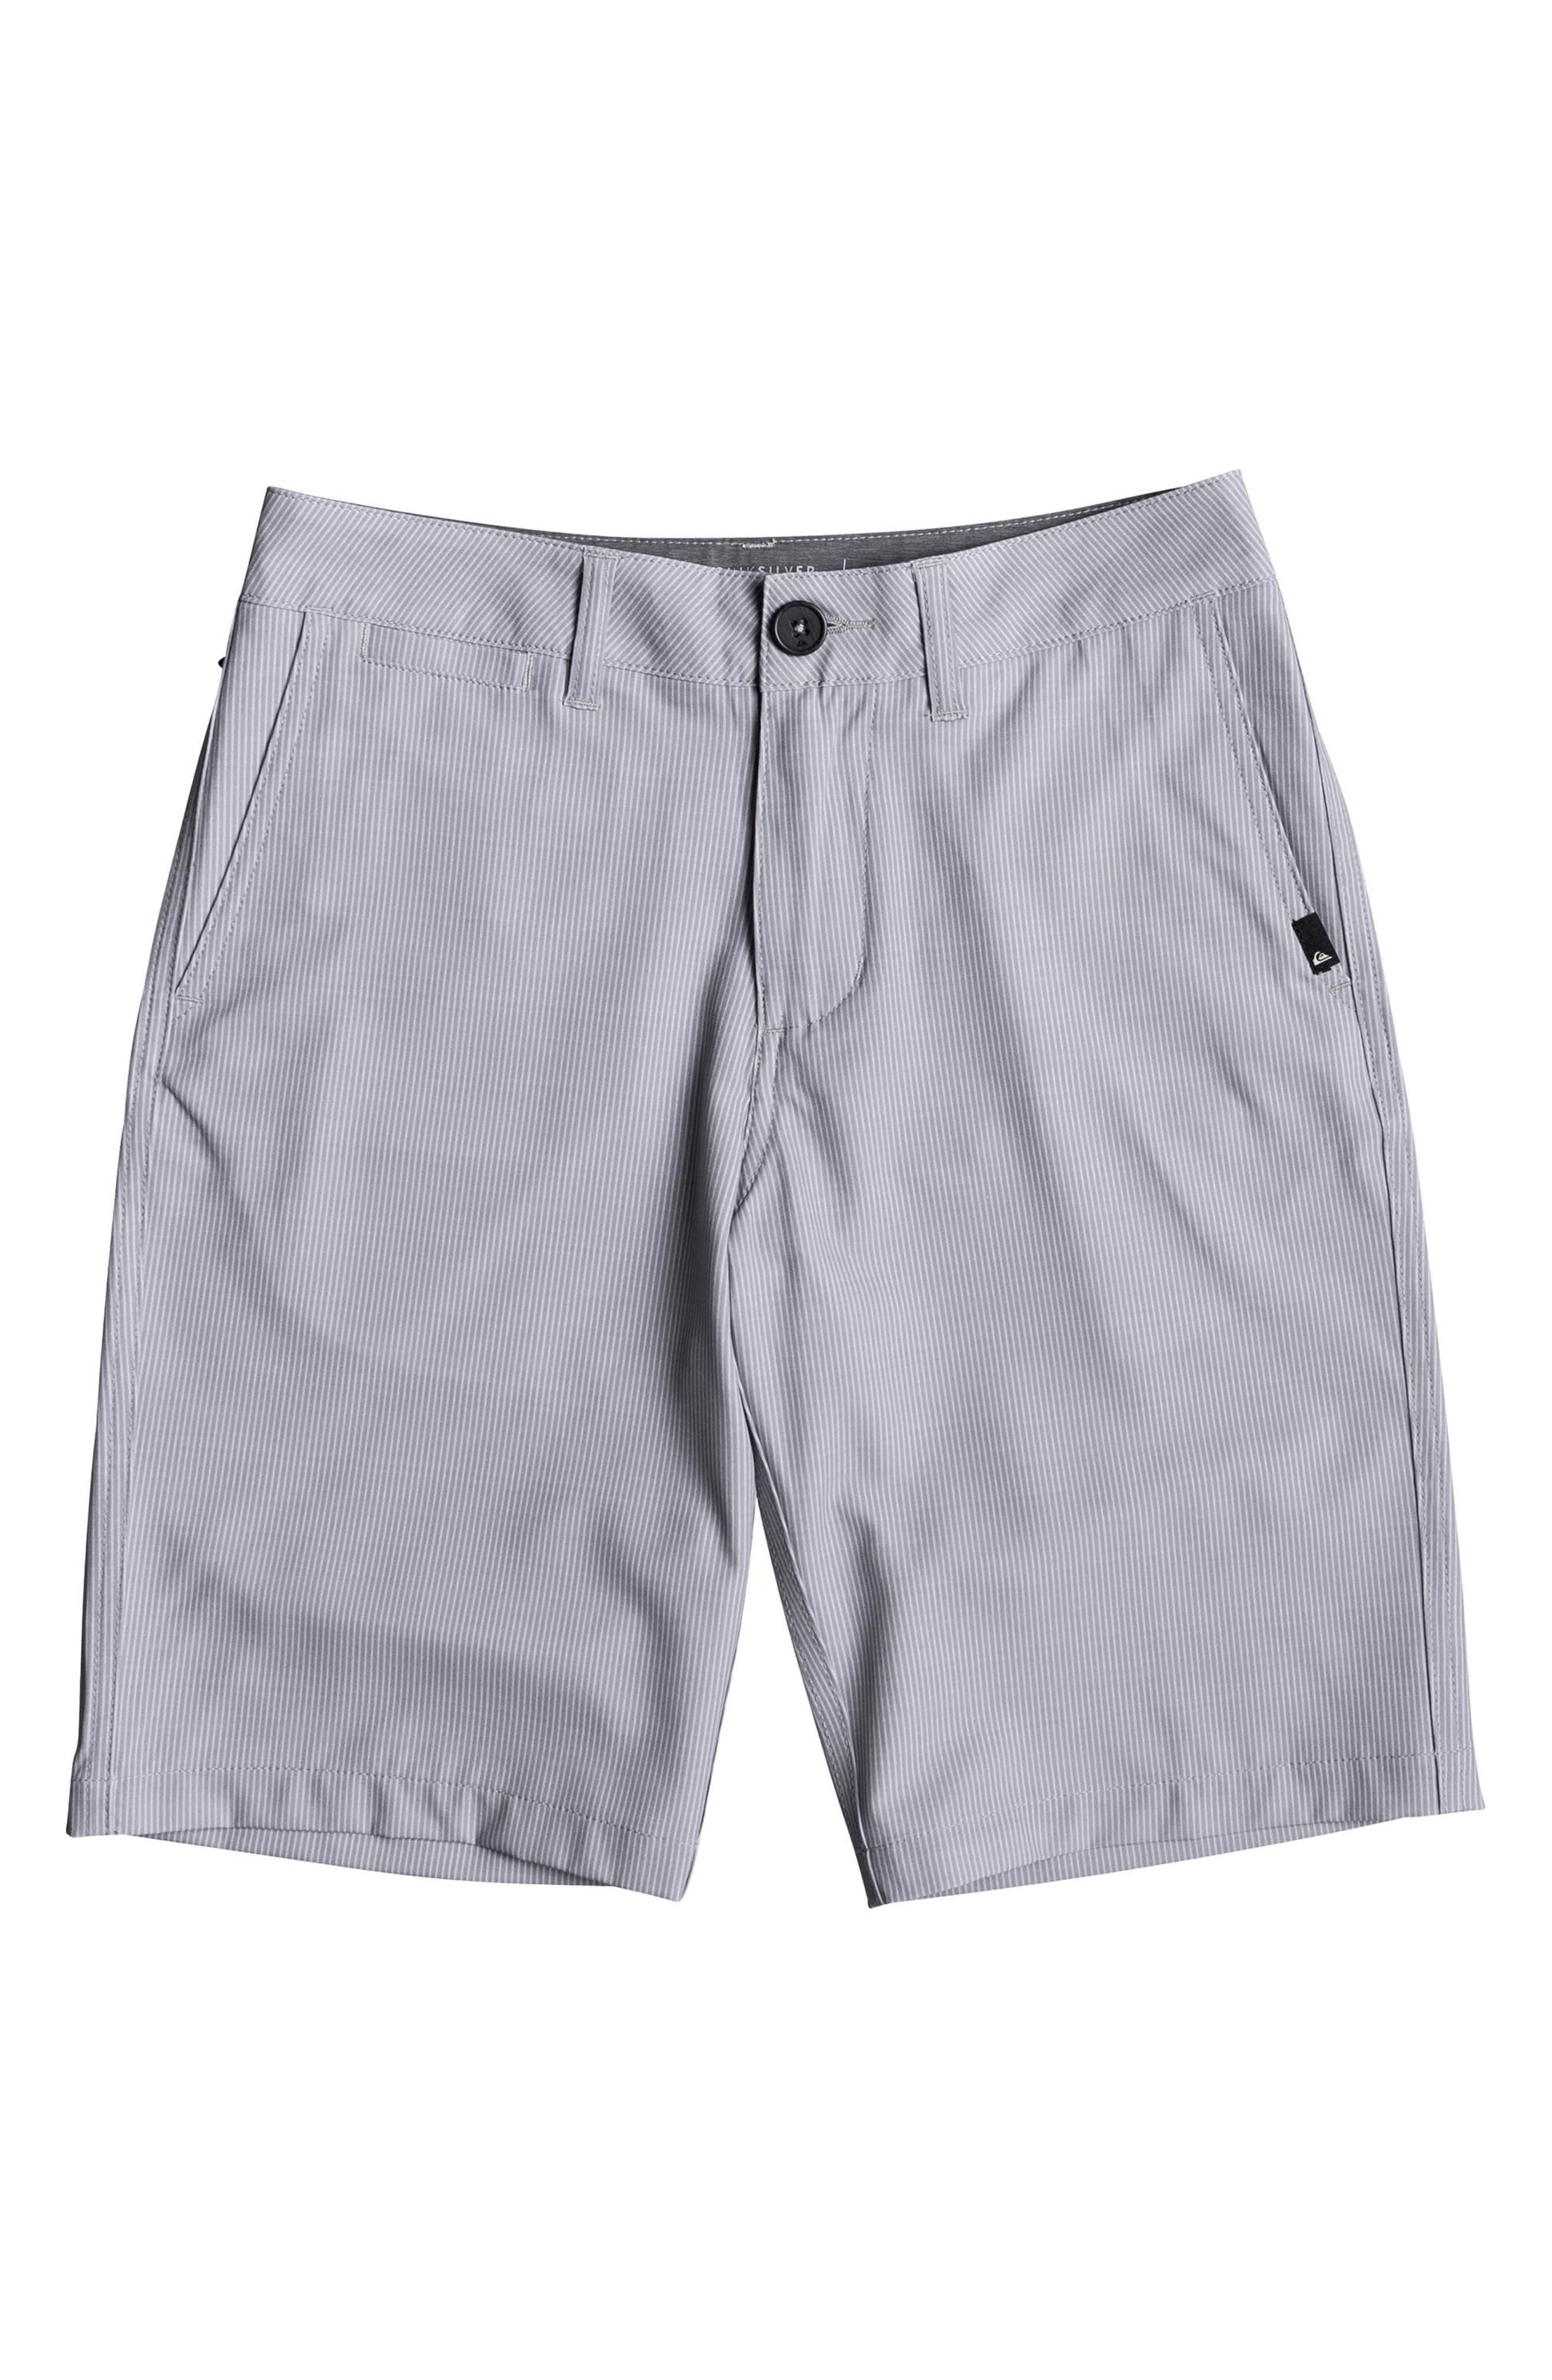 Union Pinstripe Amphibian Hybrid Shorts,                         Main,                         color, SLEET